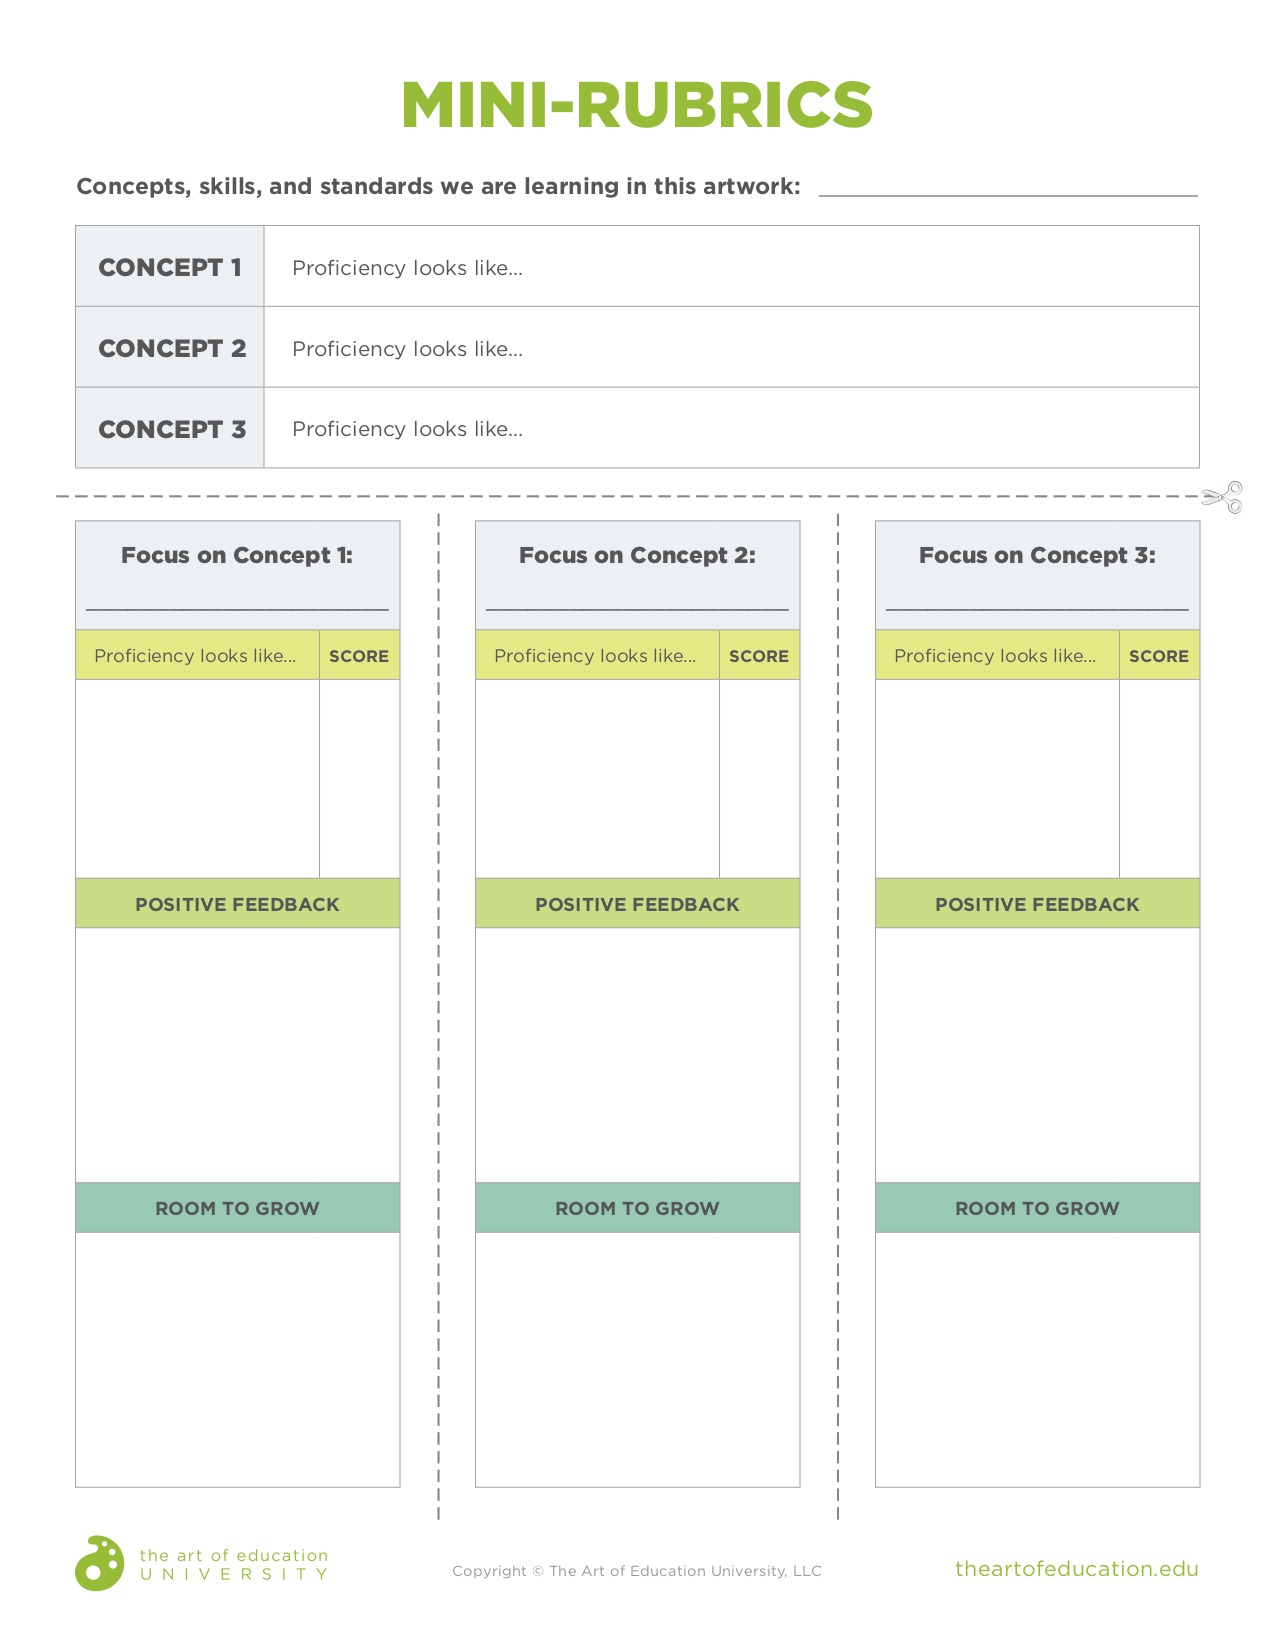 downloadable PDF with Mini-Rubric template